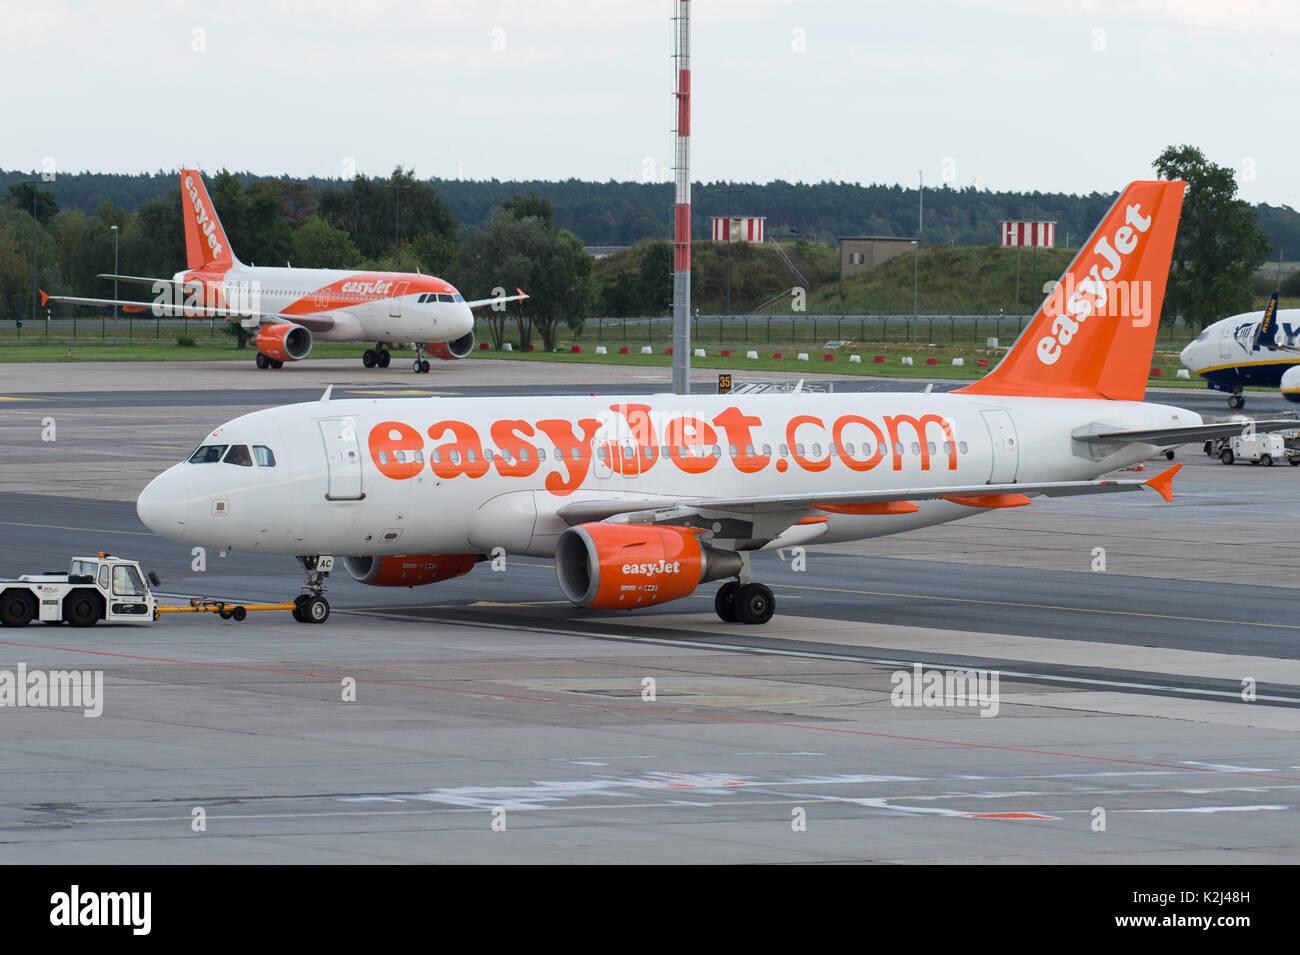 Plane at Schoenefeld Airport, easyjet,  21.08.2017 , Foto: Uwe Koch/fotobasis.de - Stock Image